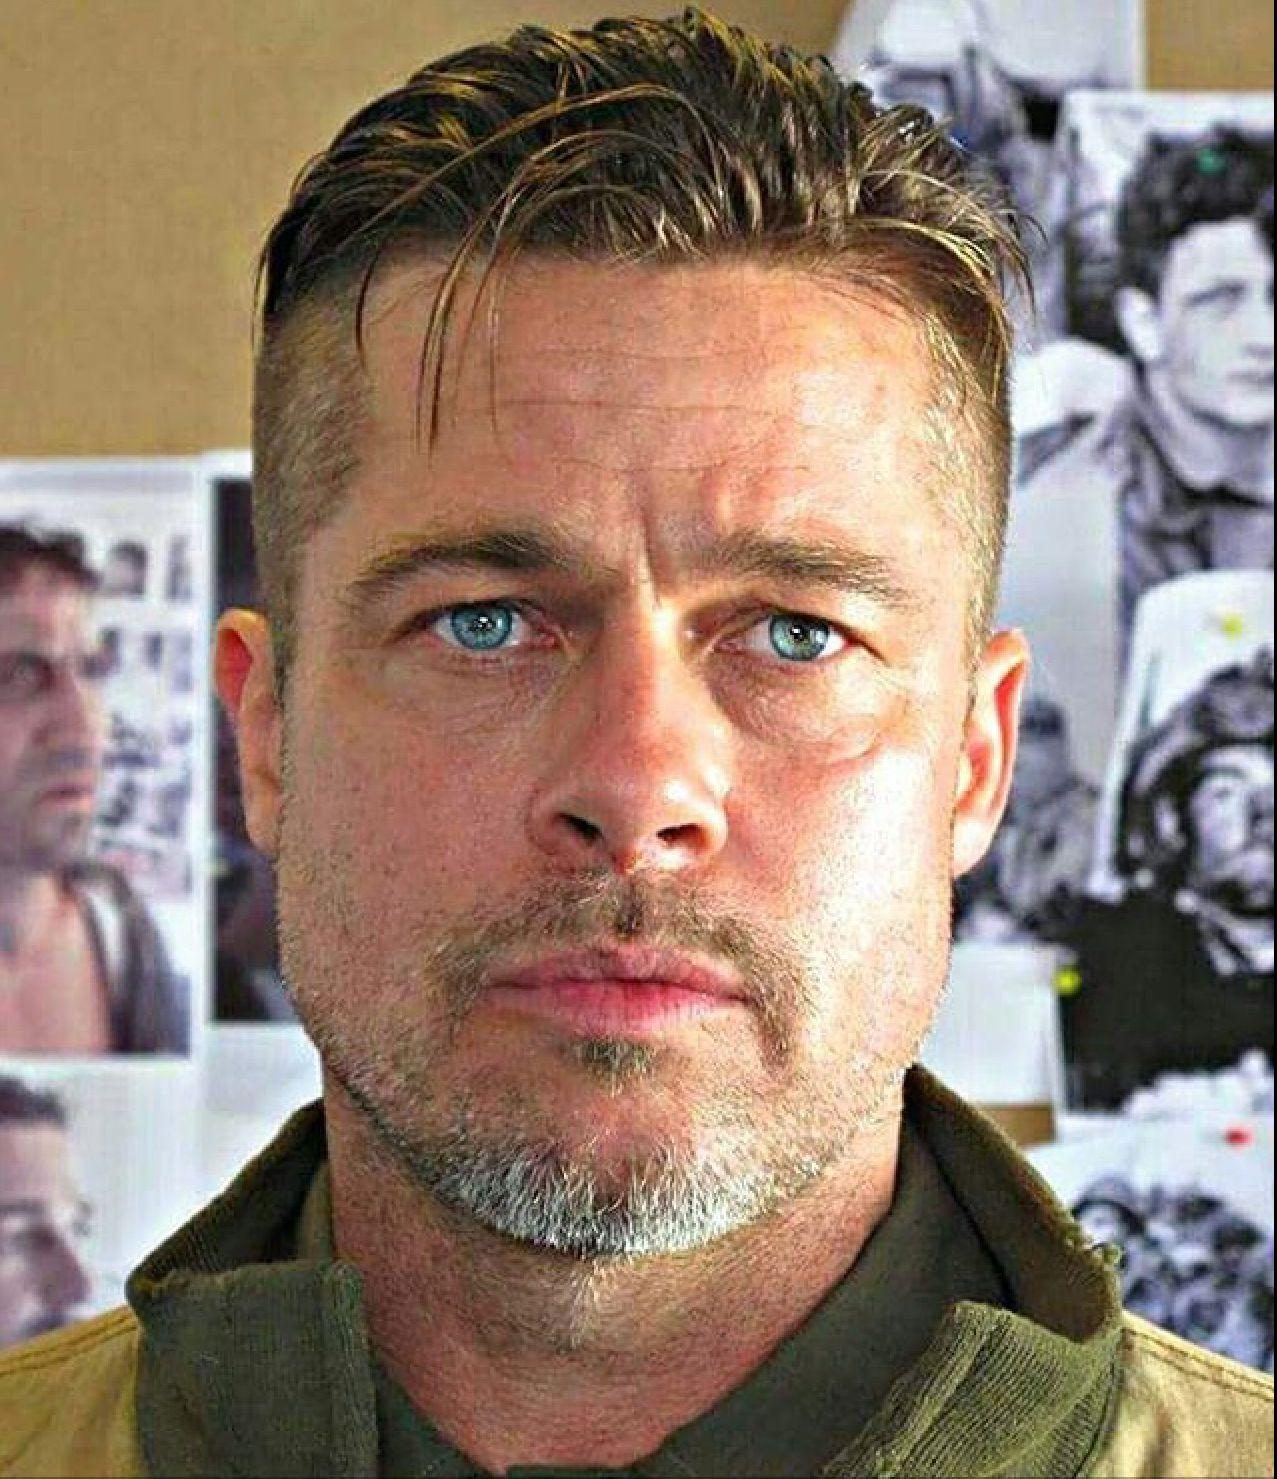 Pin By Ginger Sloan On Brad Pitt Brad Pitt Fury Haircut Fury Haircut Brad Pitt Haircut